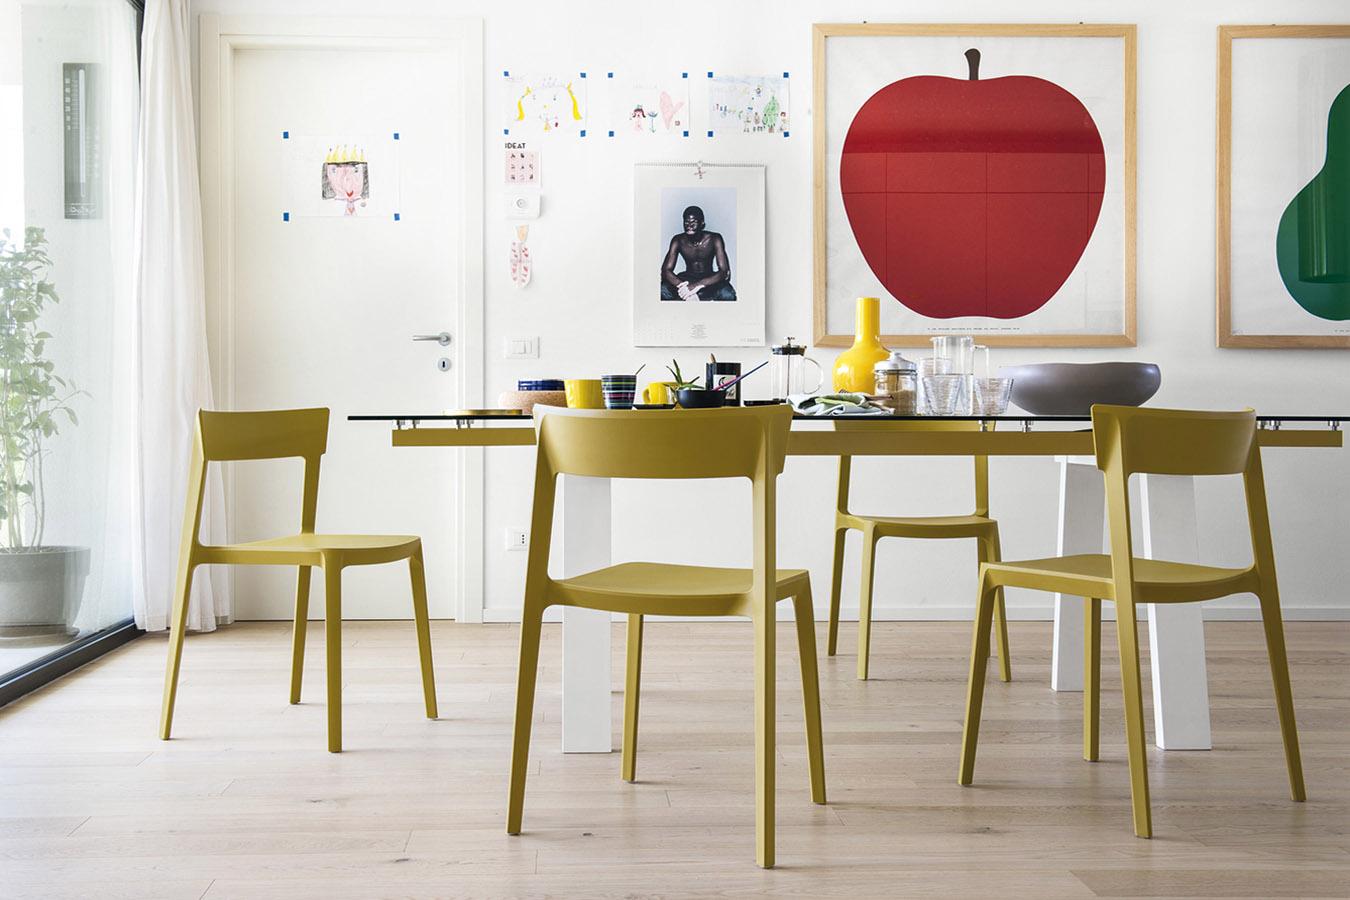 Tavoli e sedie - Righetti Mobili Novara